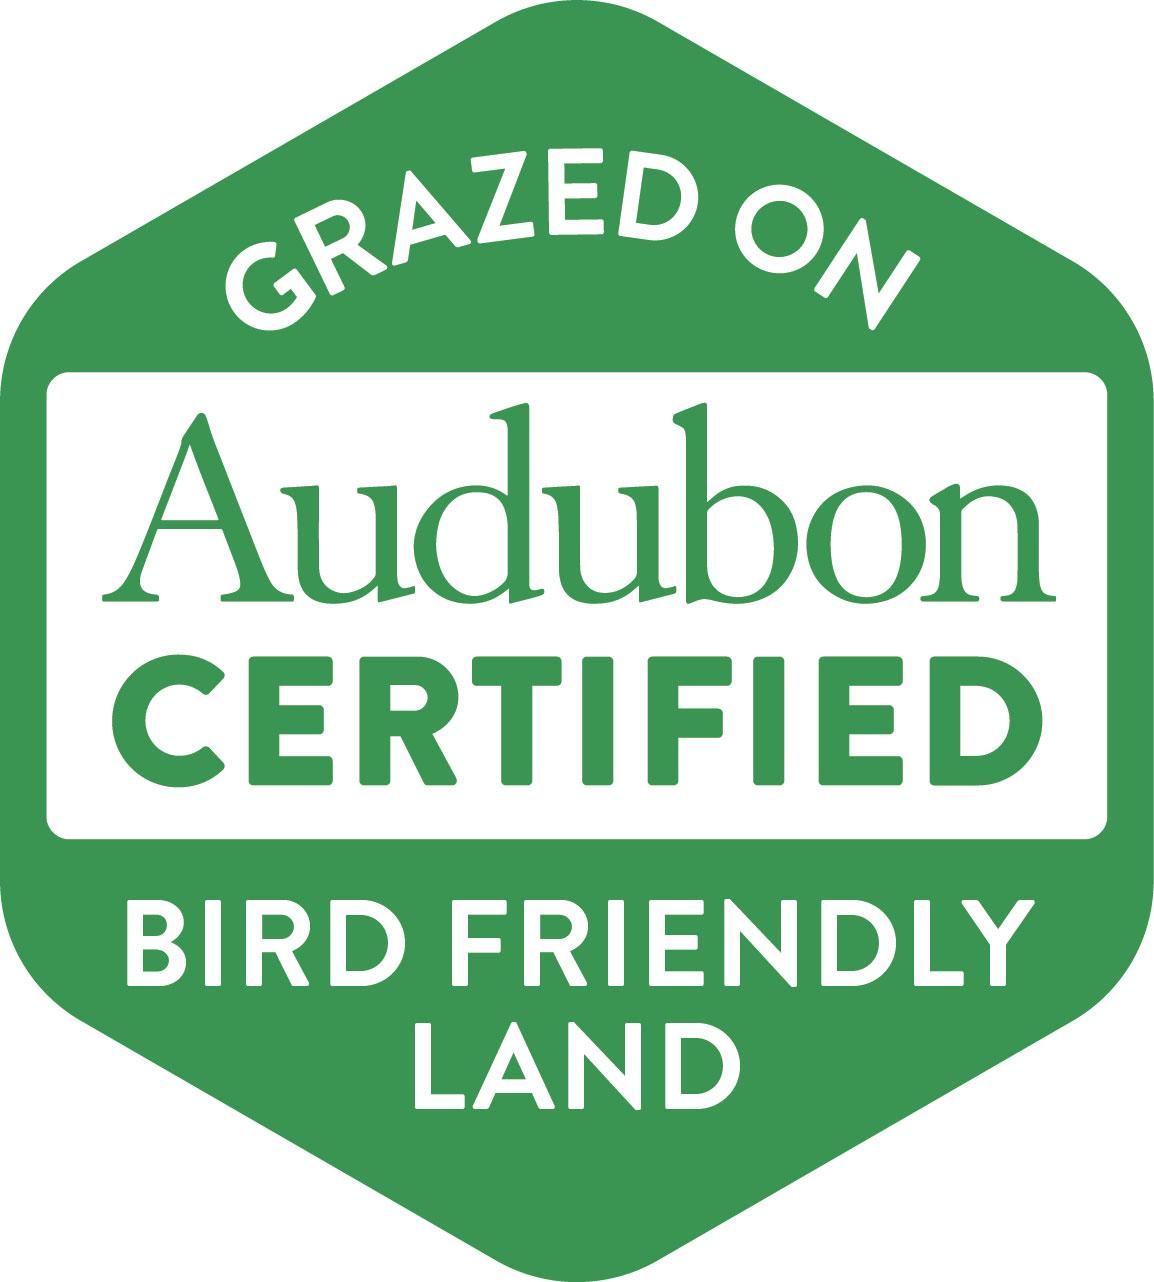 Audubon label on Western beef.